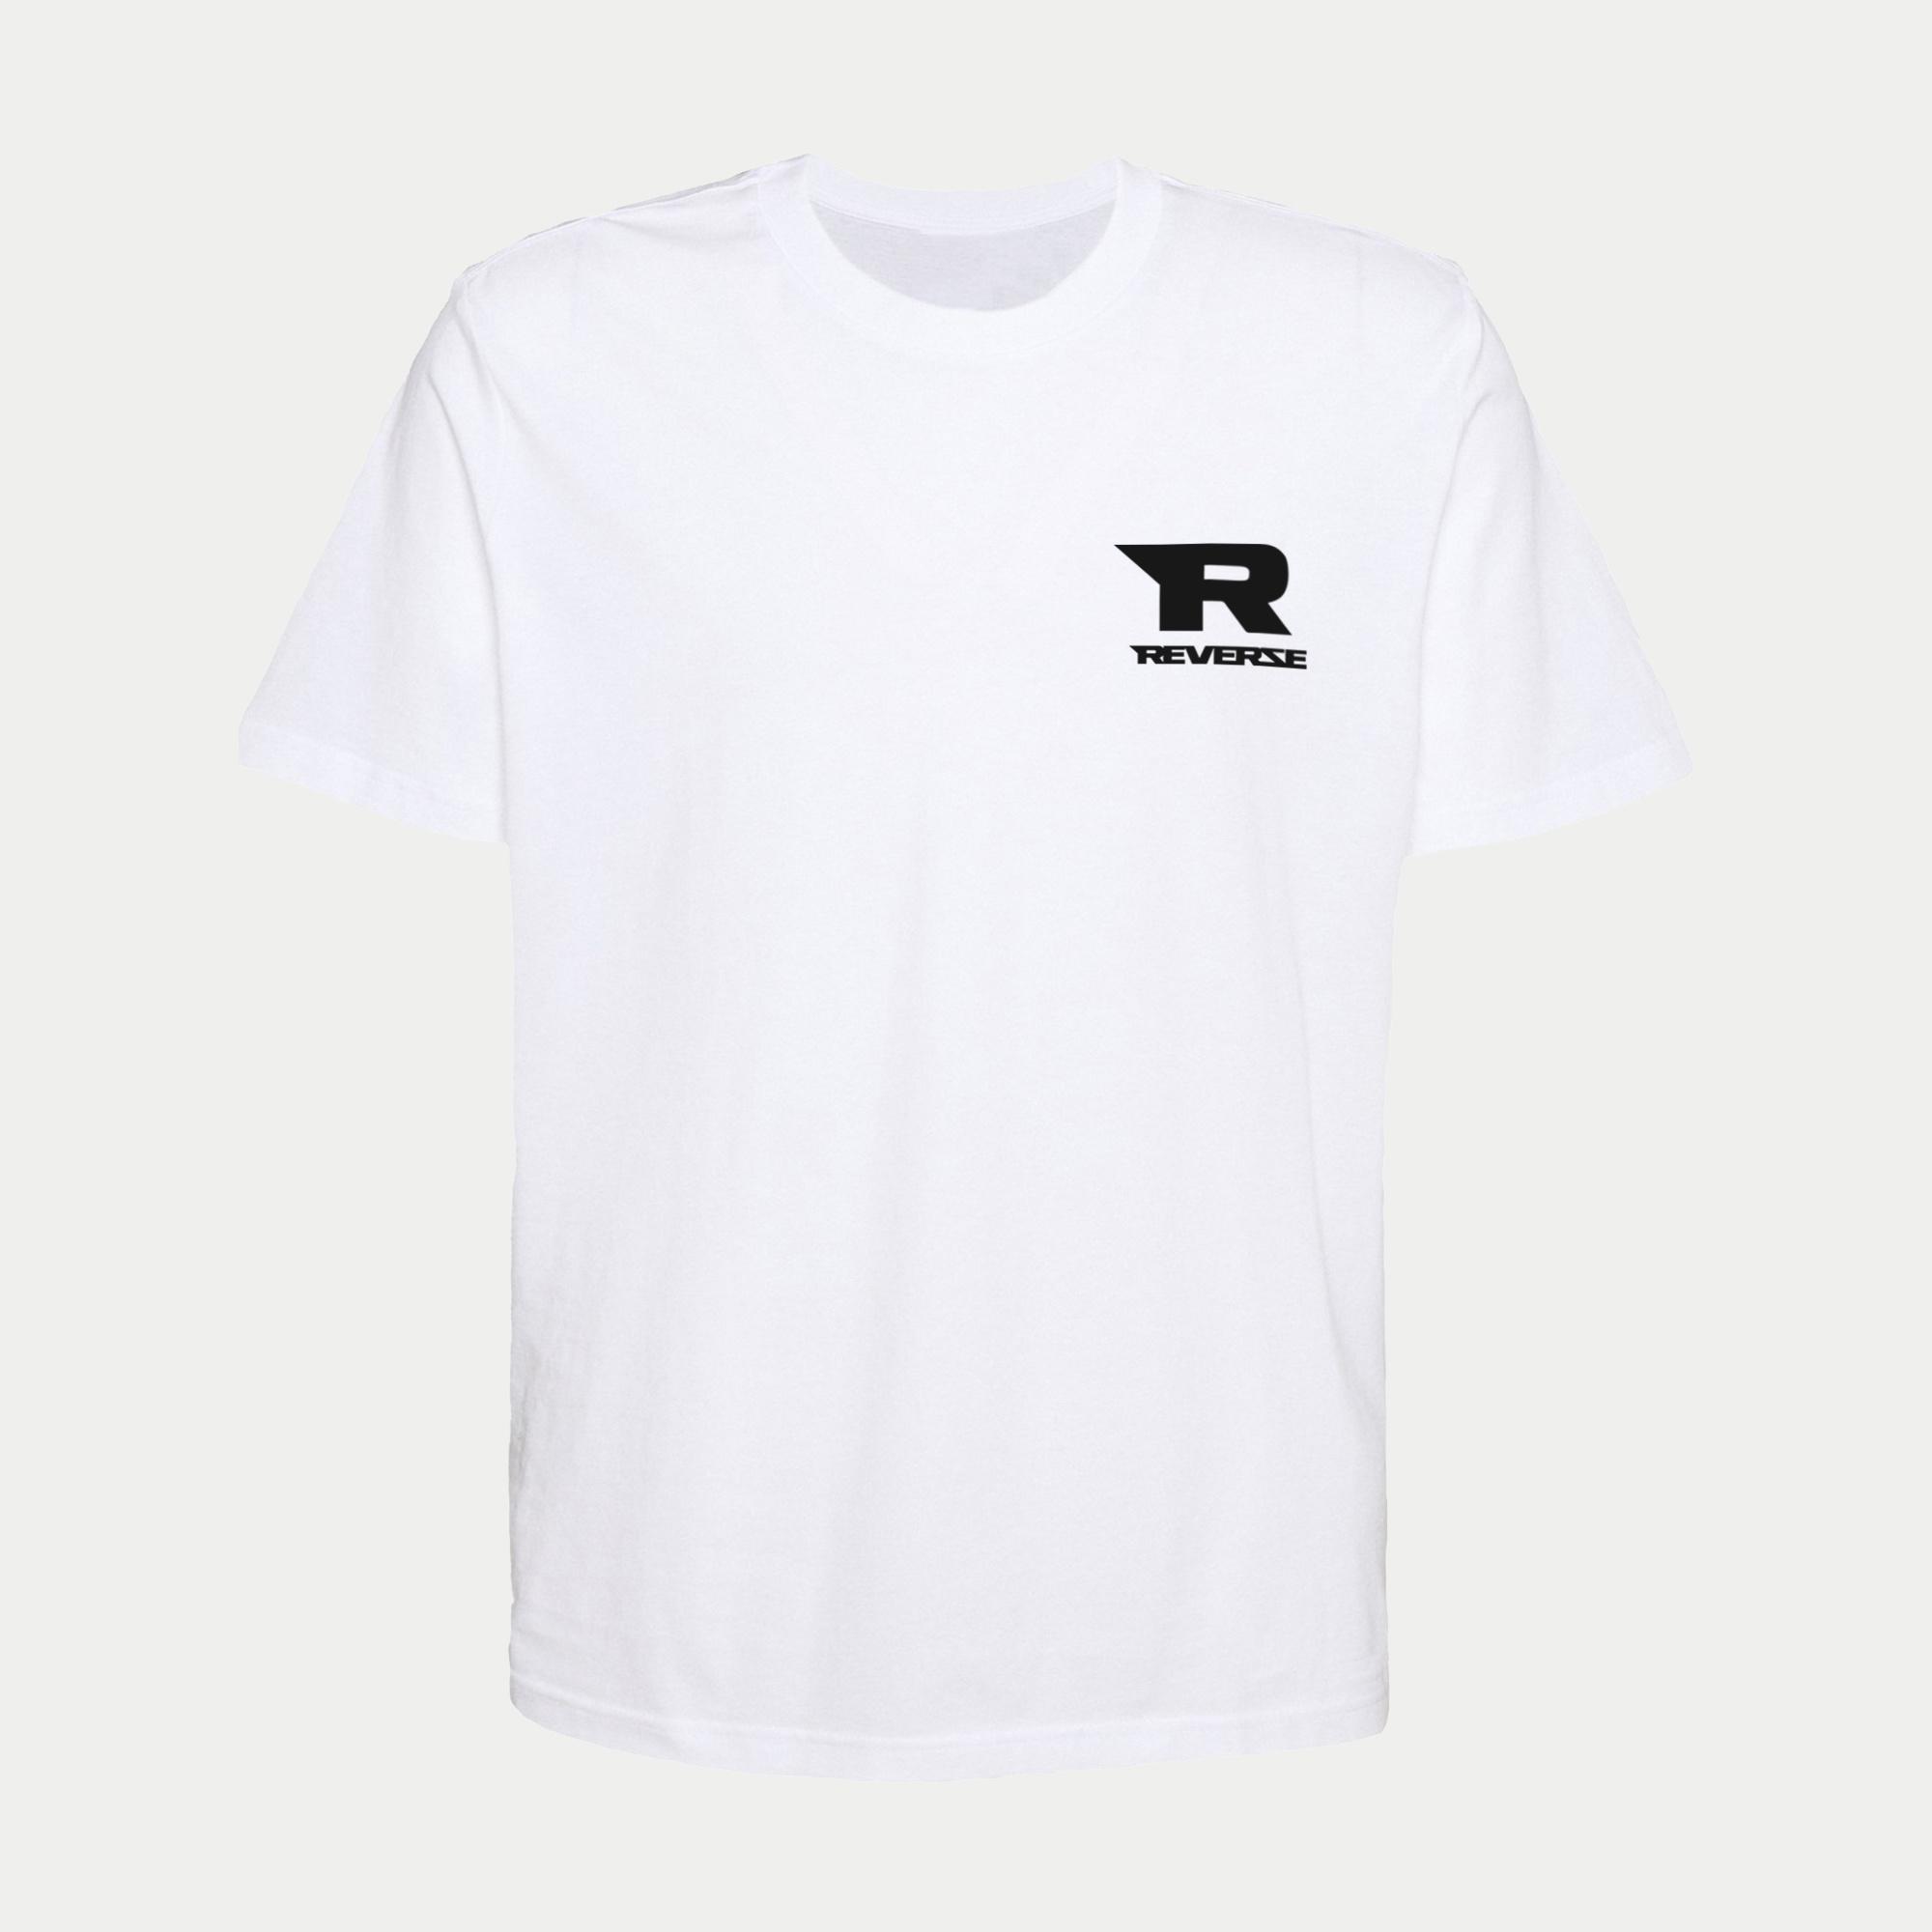 Reverze - Classic White T-Shirt